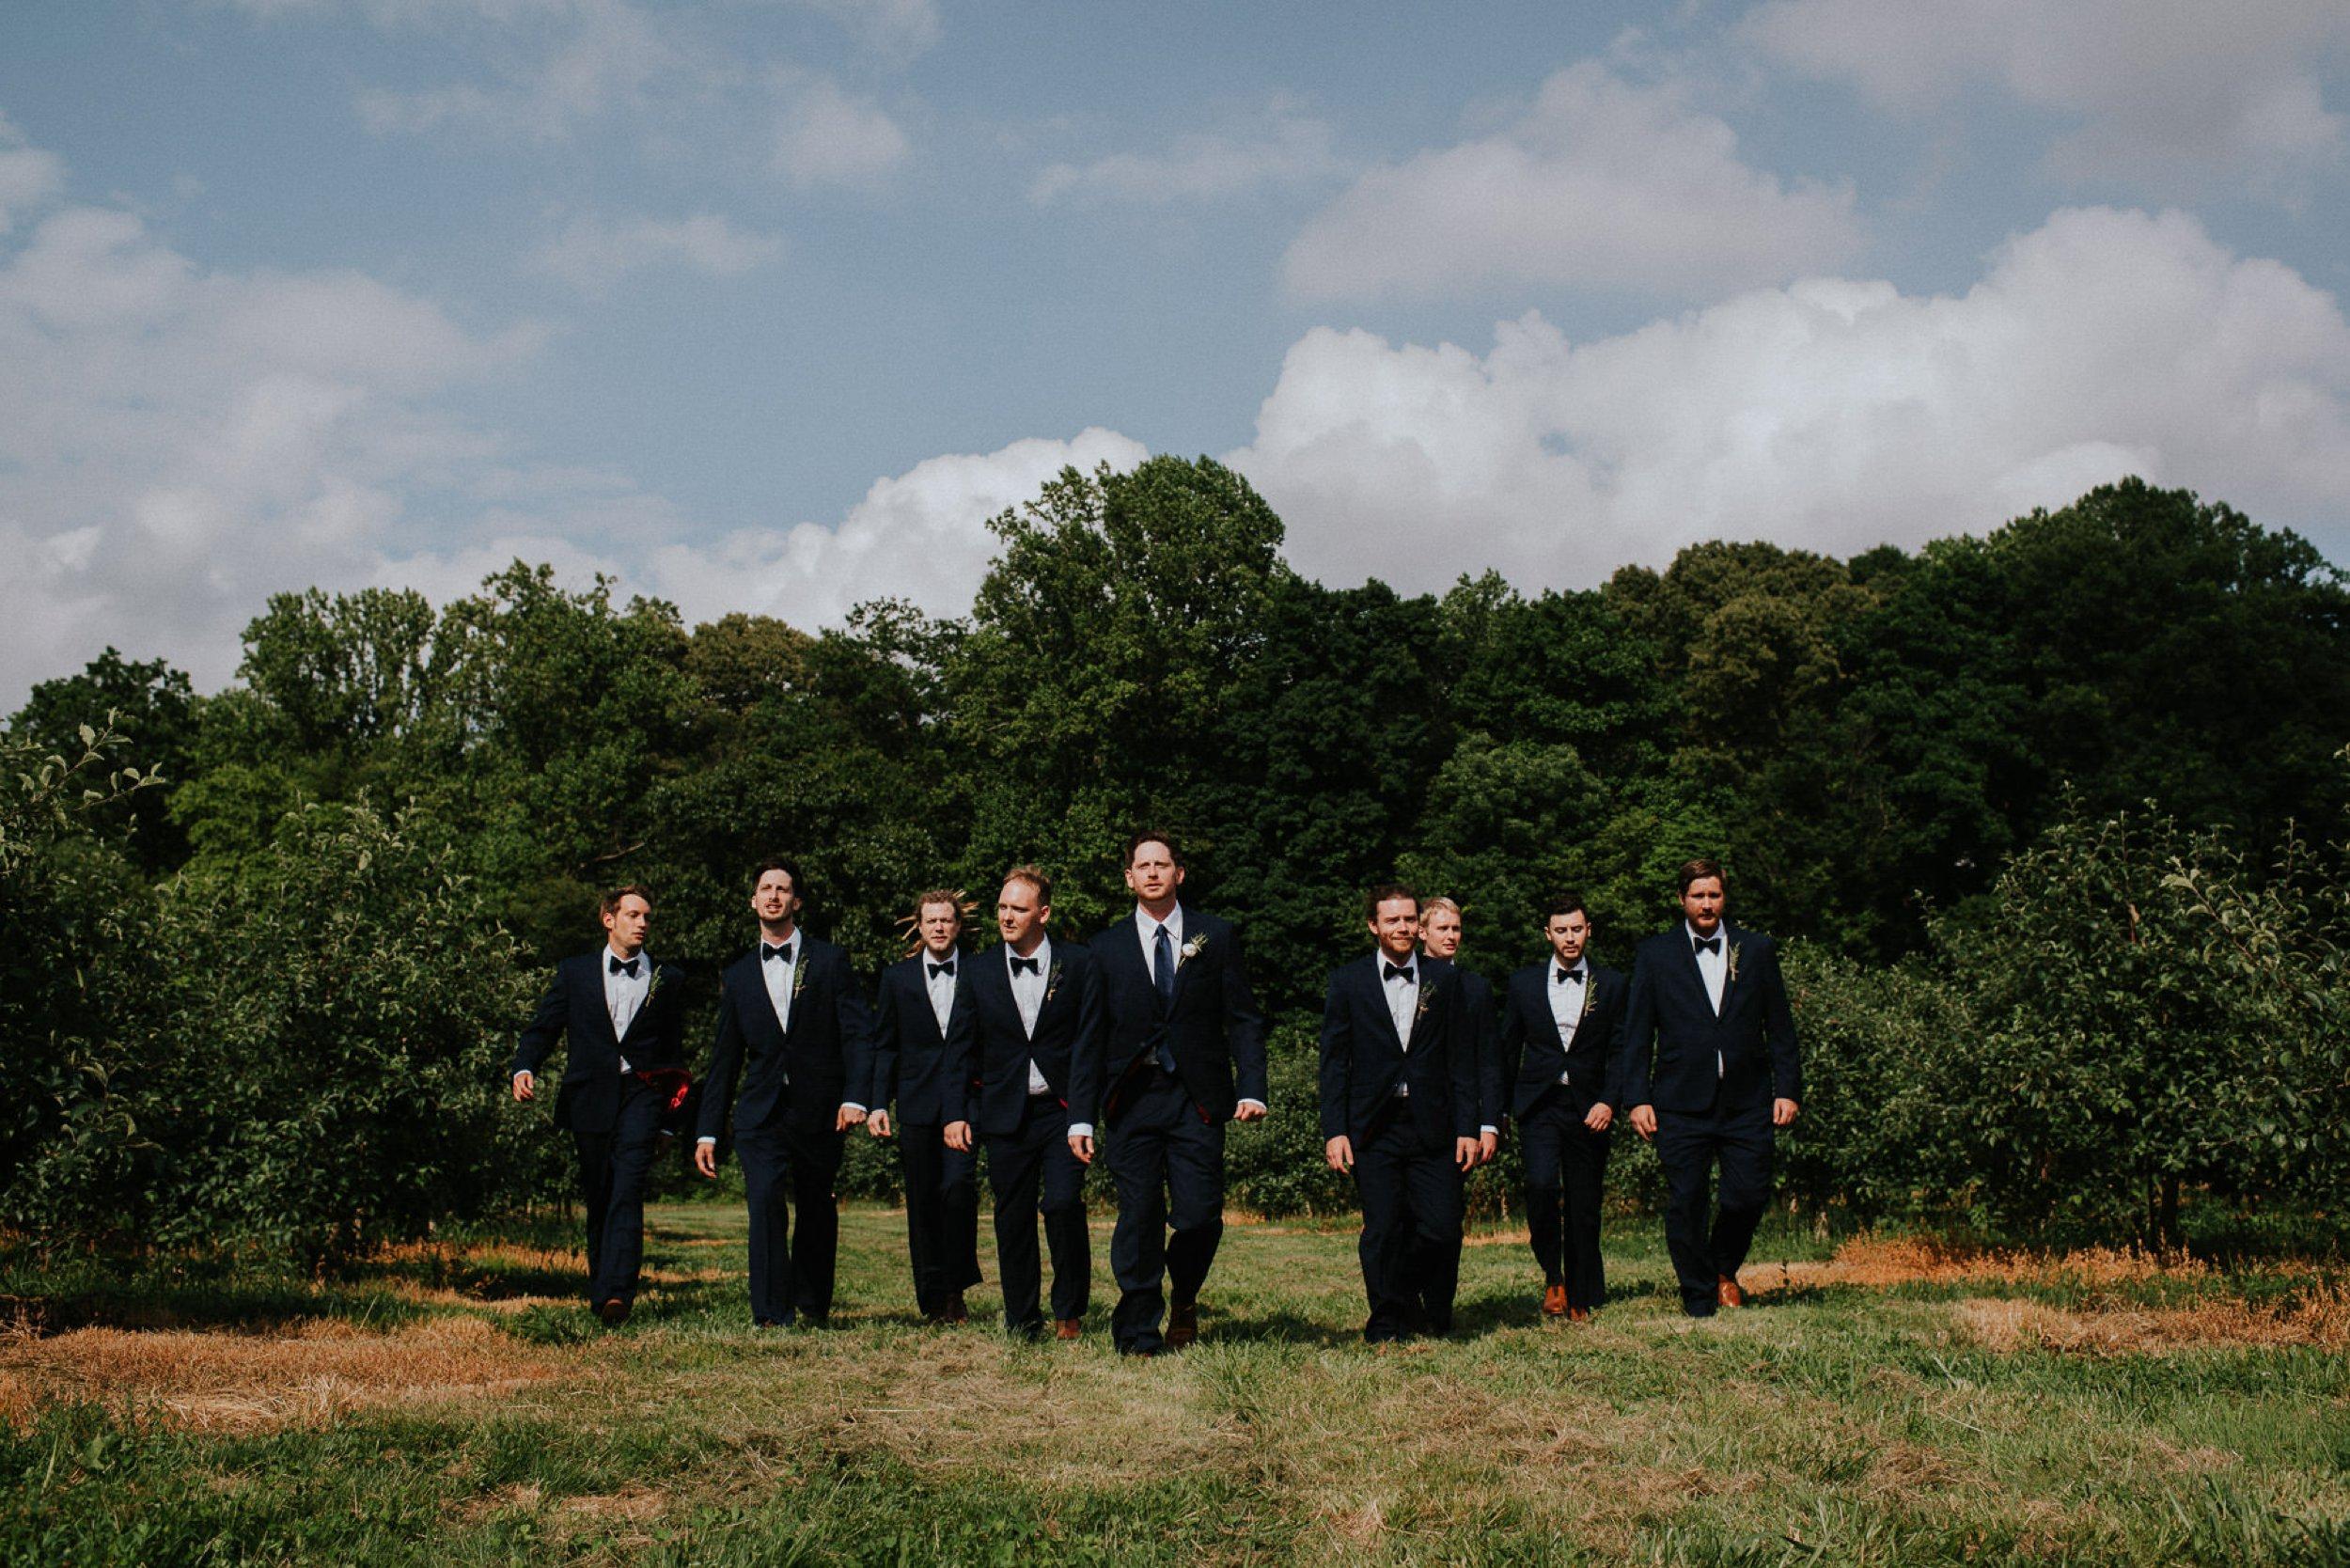 milburn_farms-wedding-9.jpg